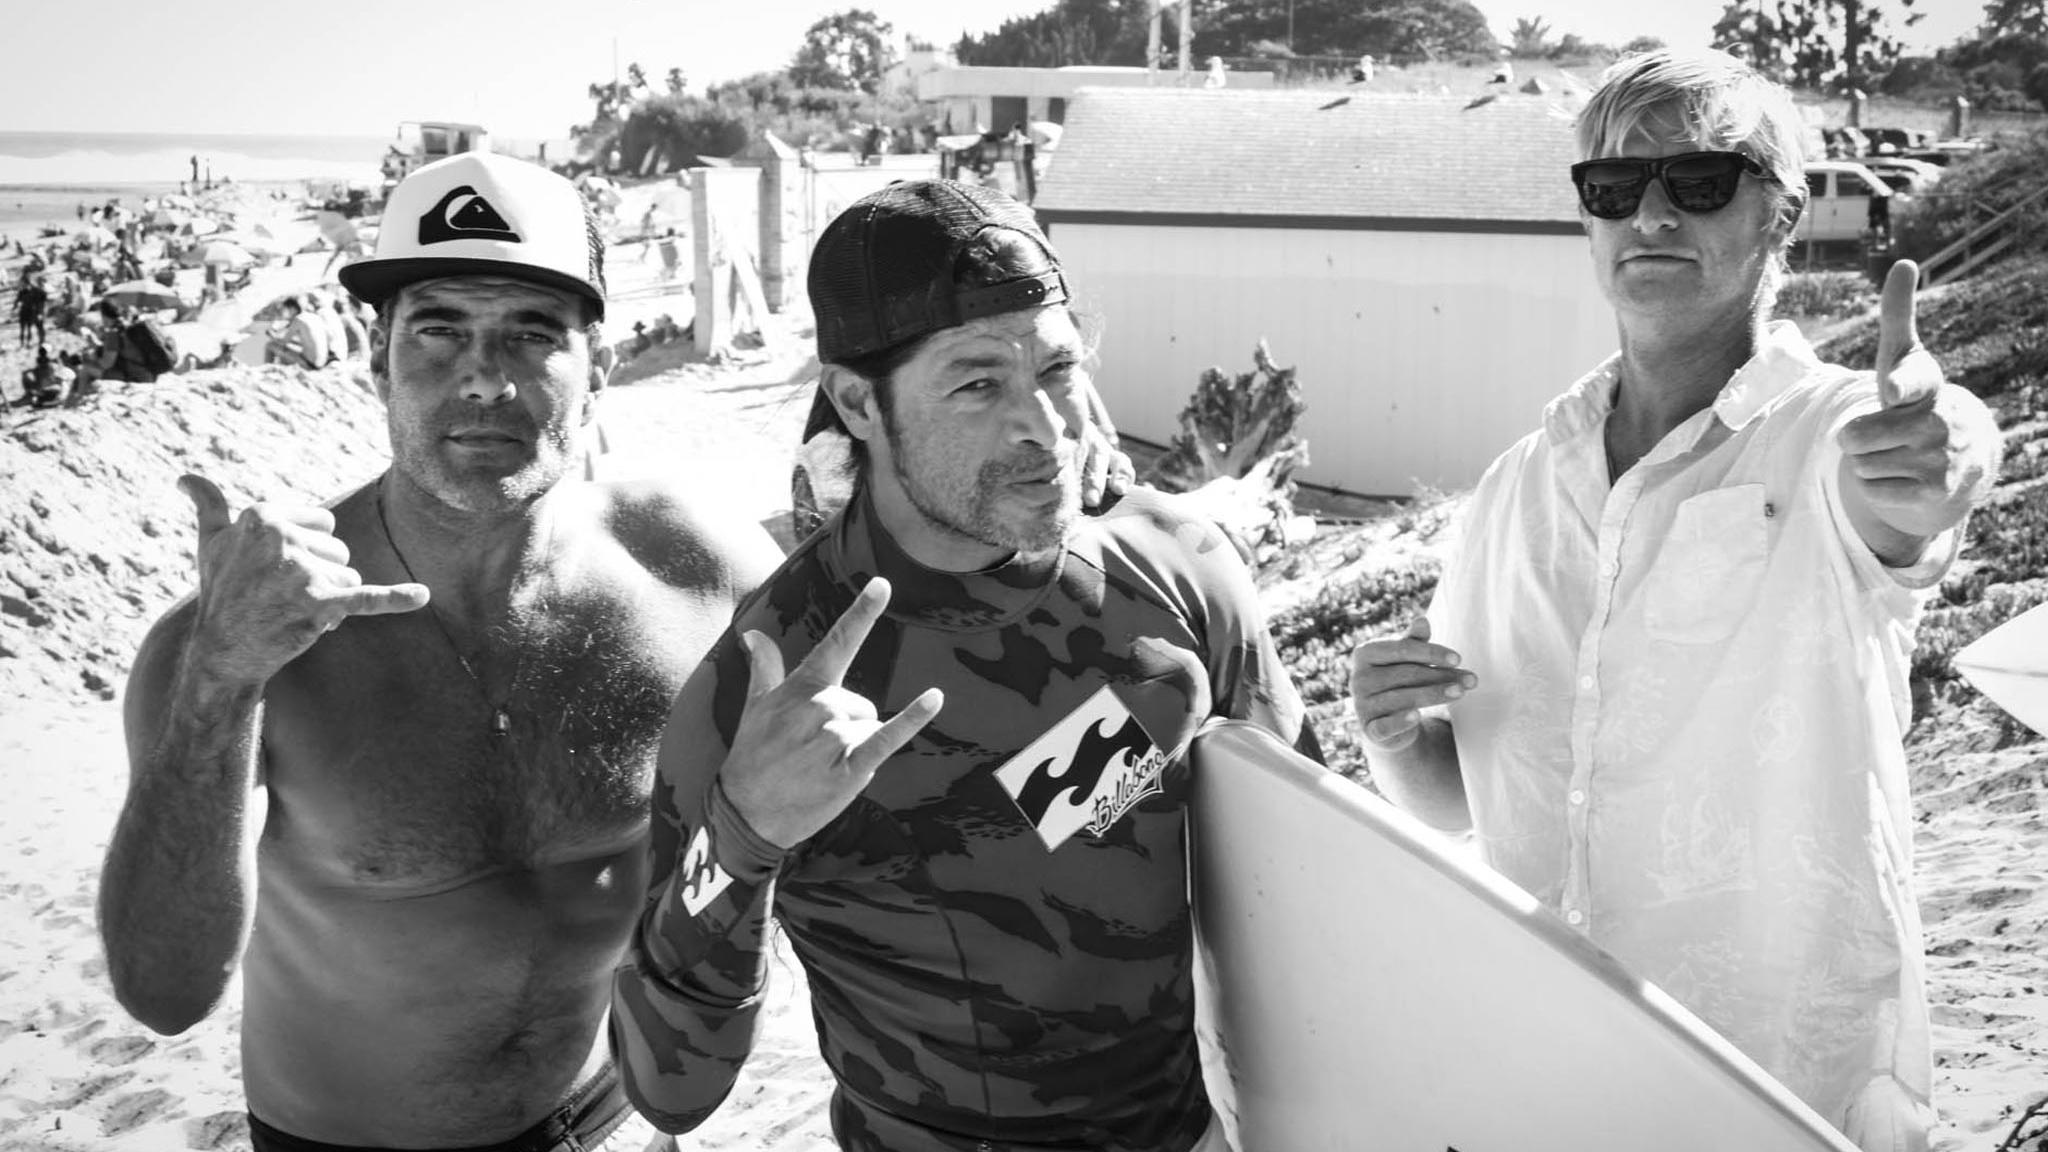 Trujillo, Wasilewski and Carlos Del Olmo